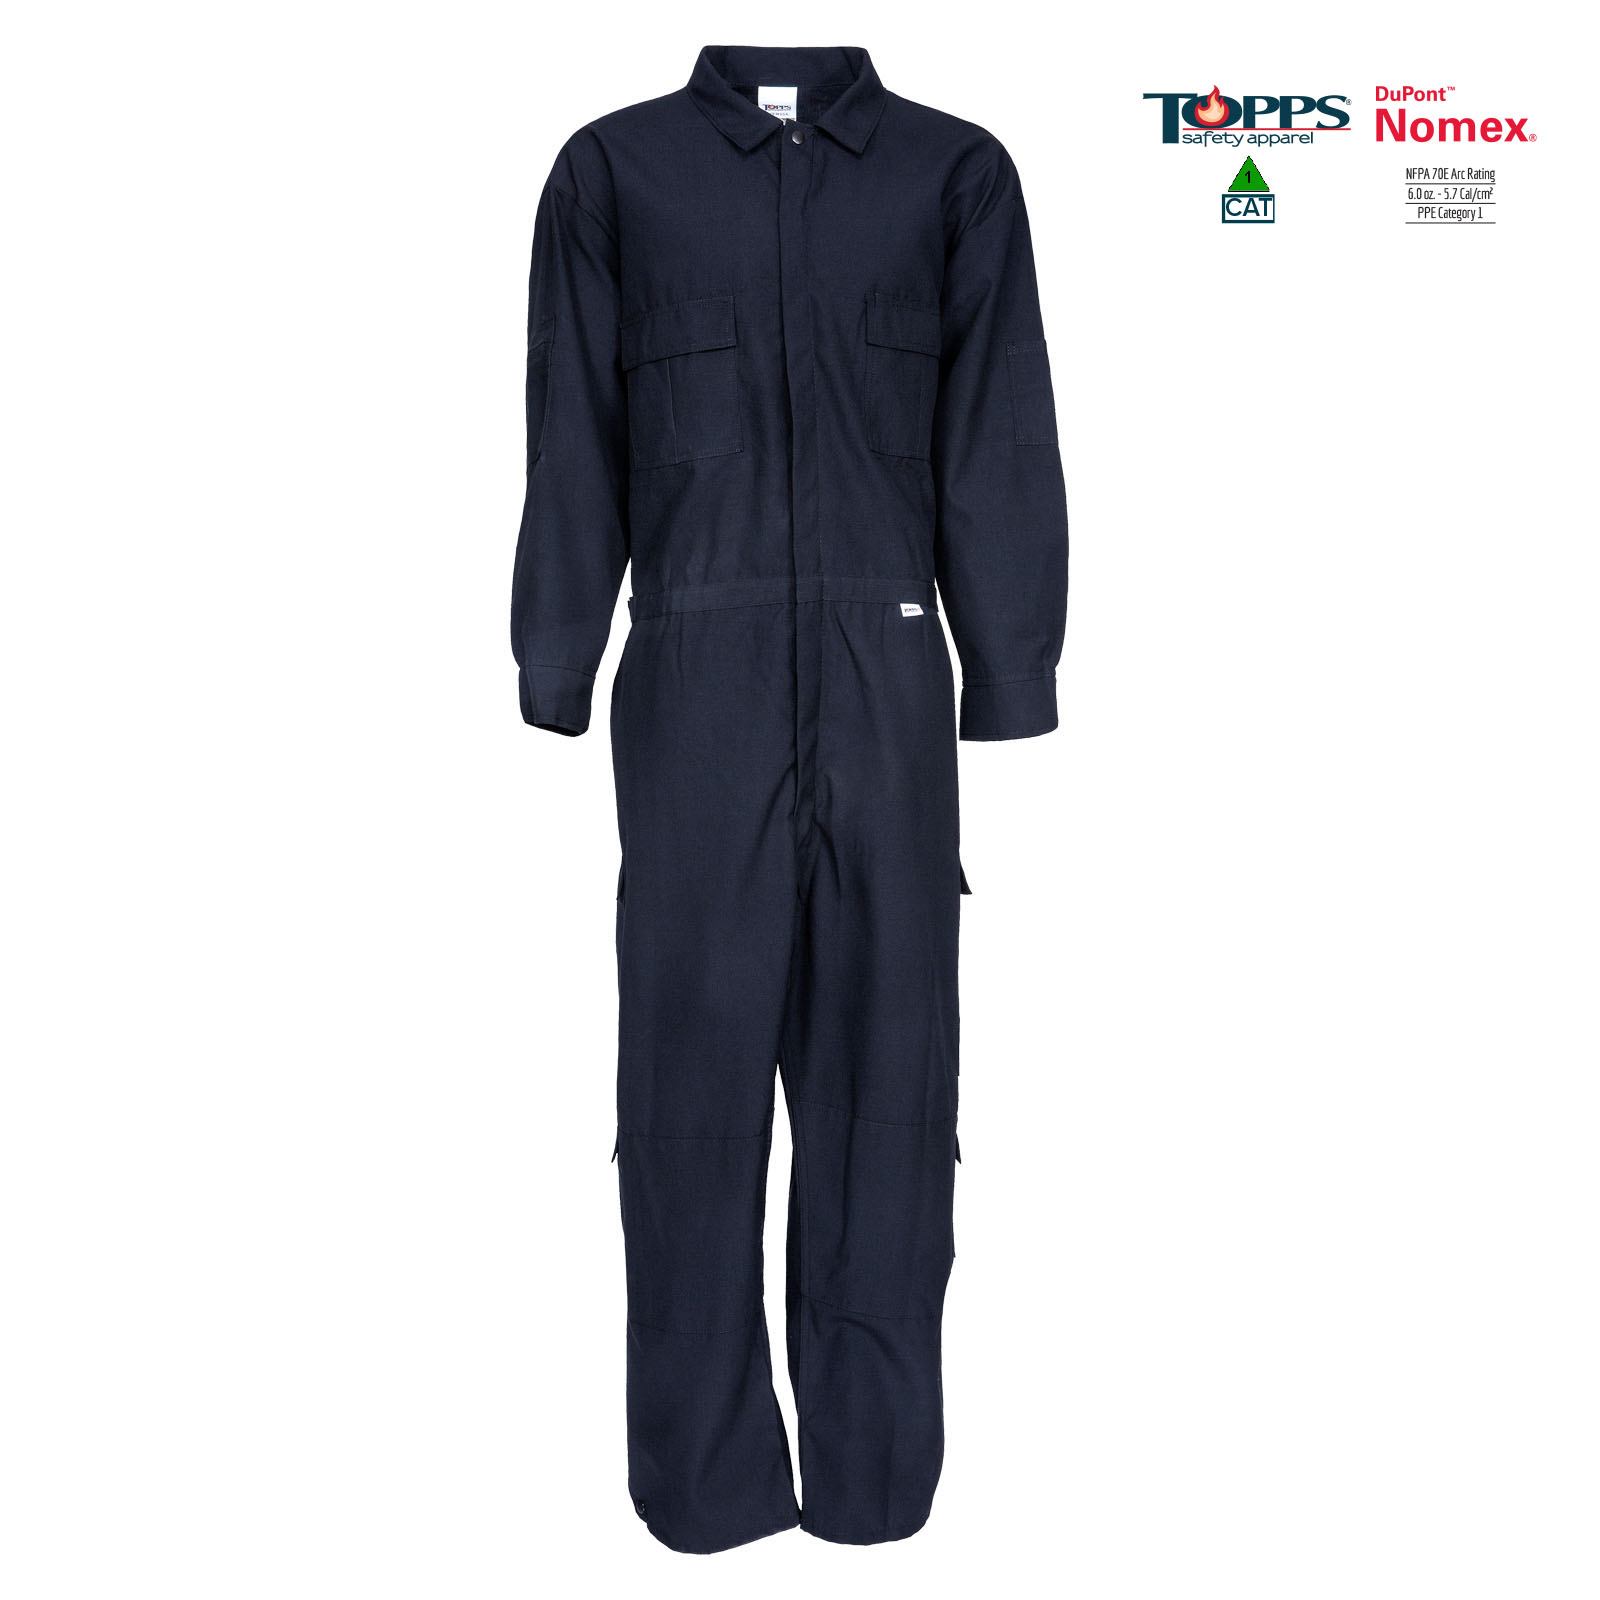 NOMEX® T14 Flame Resistant Squad Suit-TOPPS